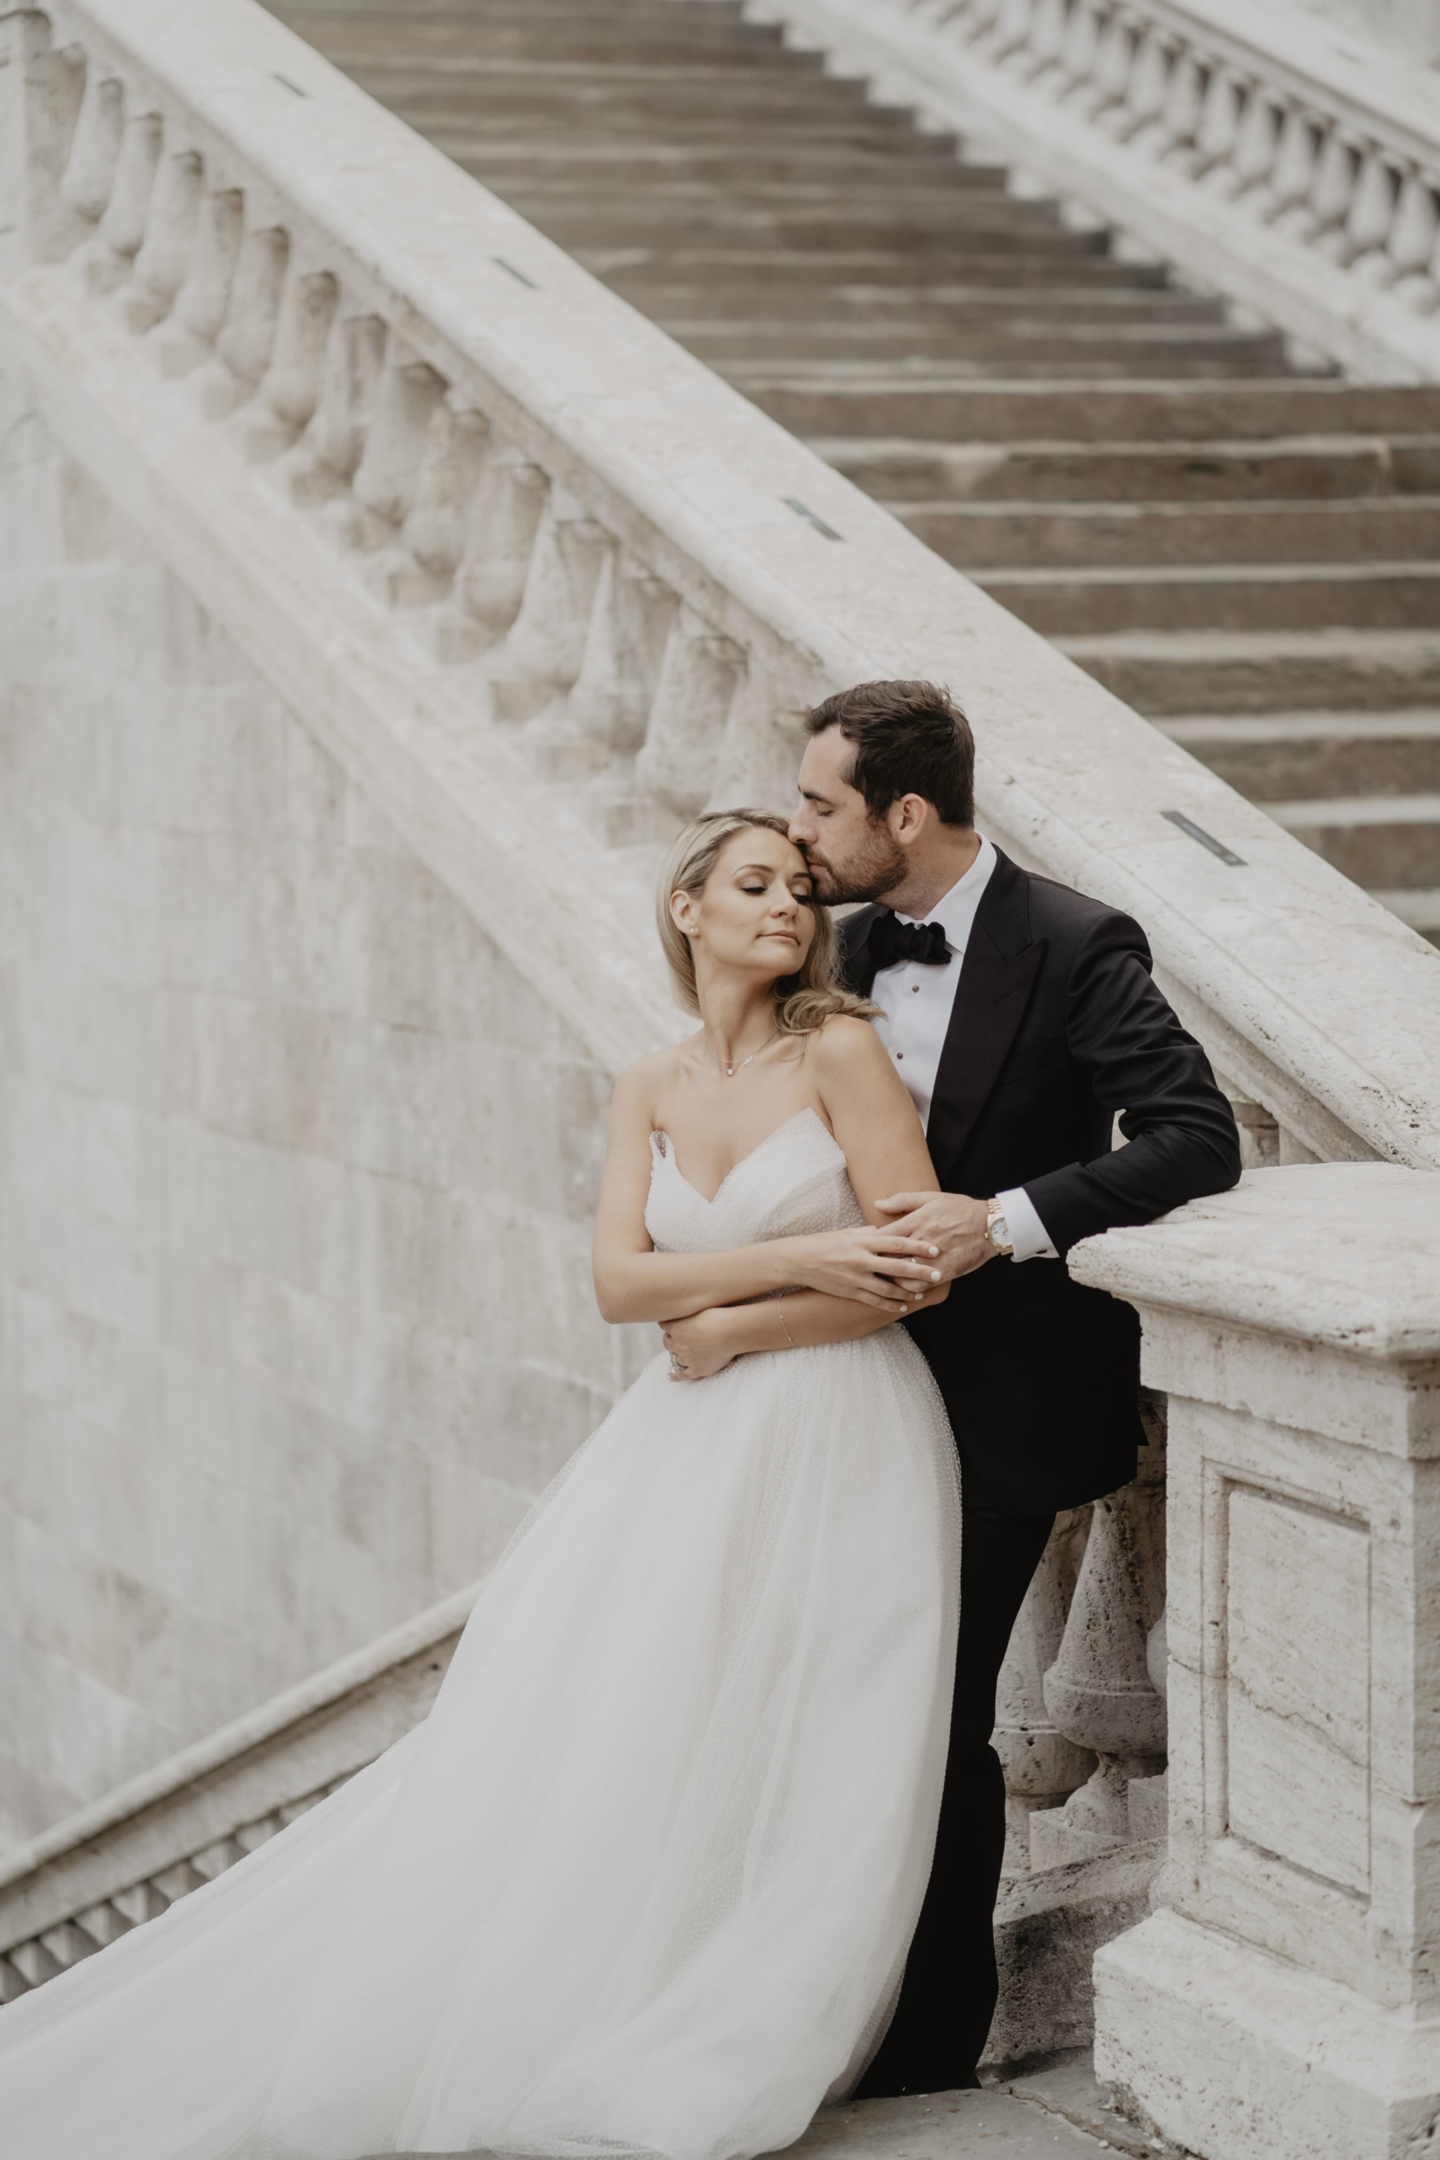 A sparkling wedding in the shore of the Arno - 59 :: A sparkling wedding on the shore of the Arno :: Luxury wedding photography - 58 :: A sparkling wedding in the shore of the Arno - 59